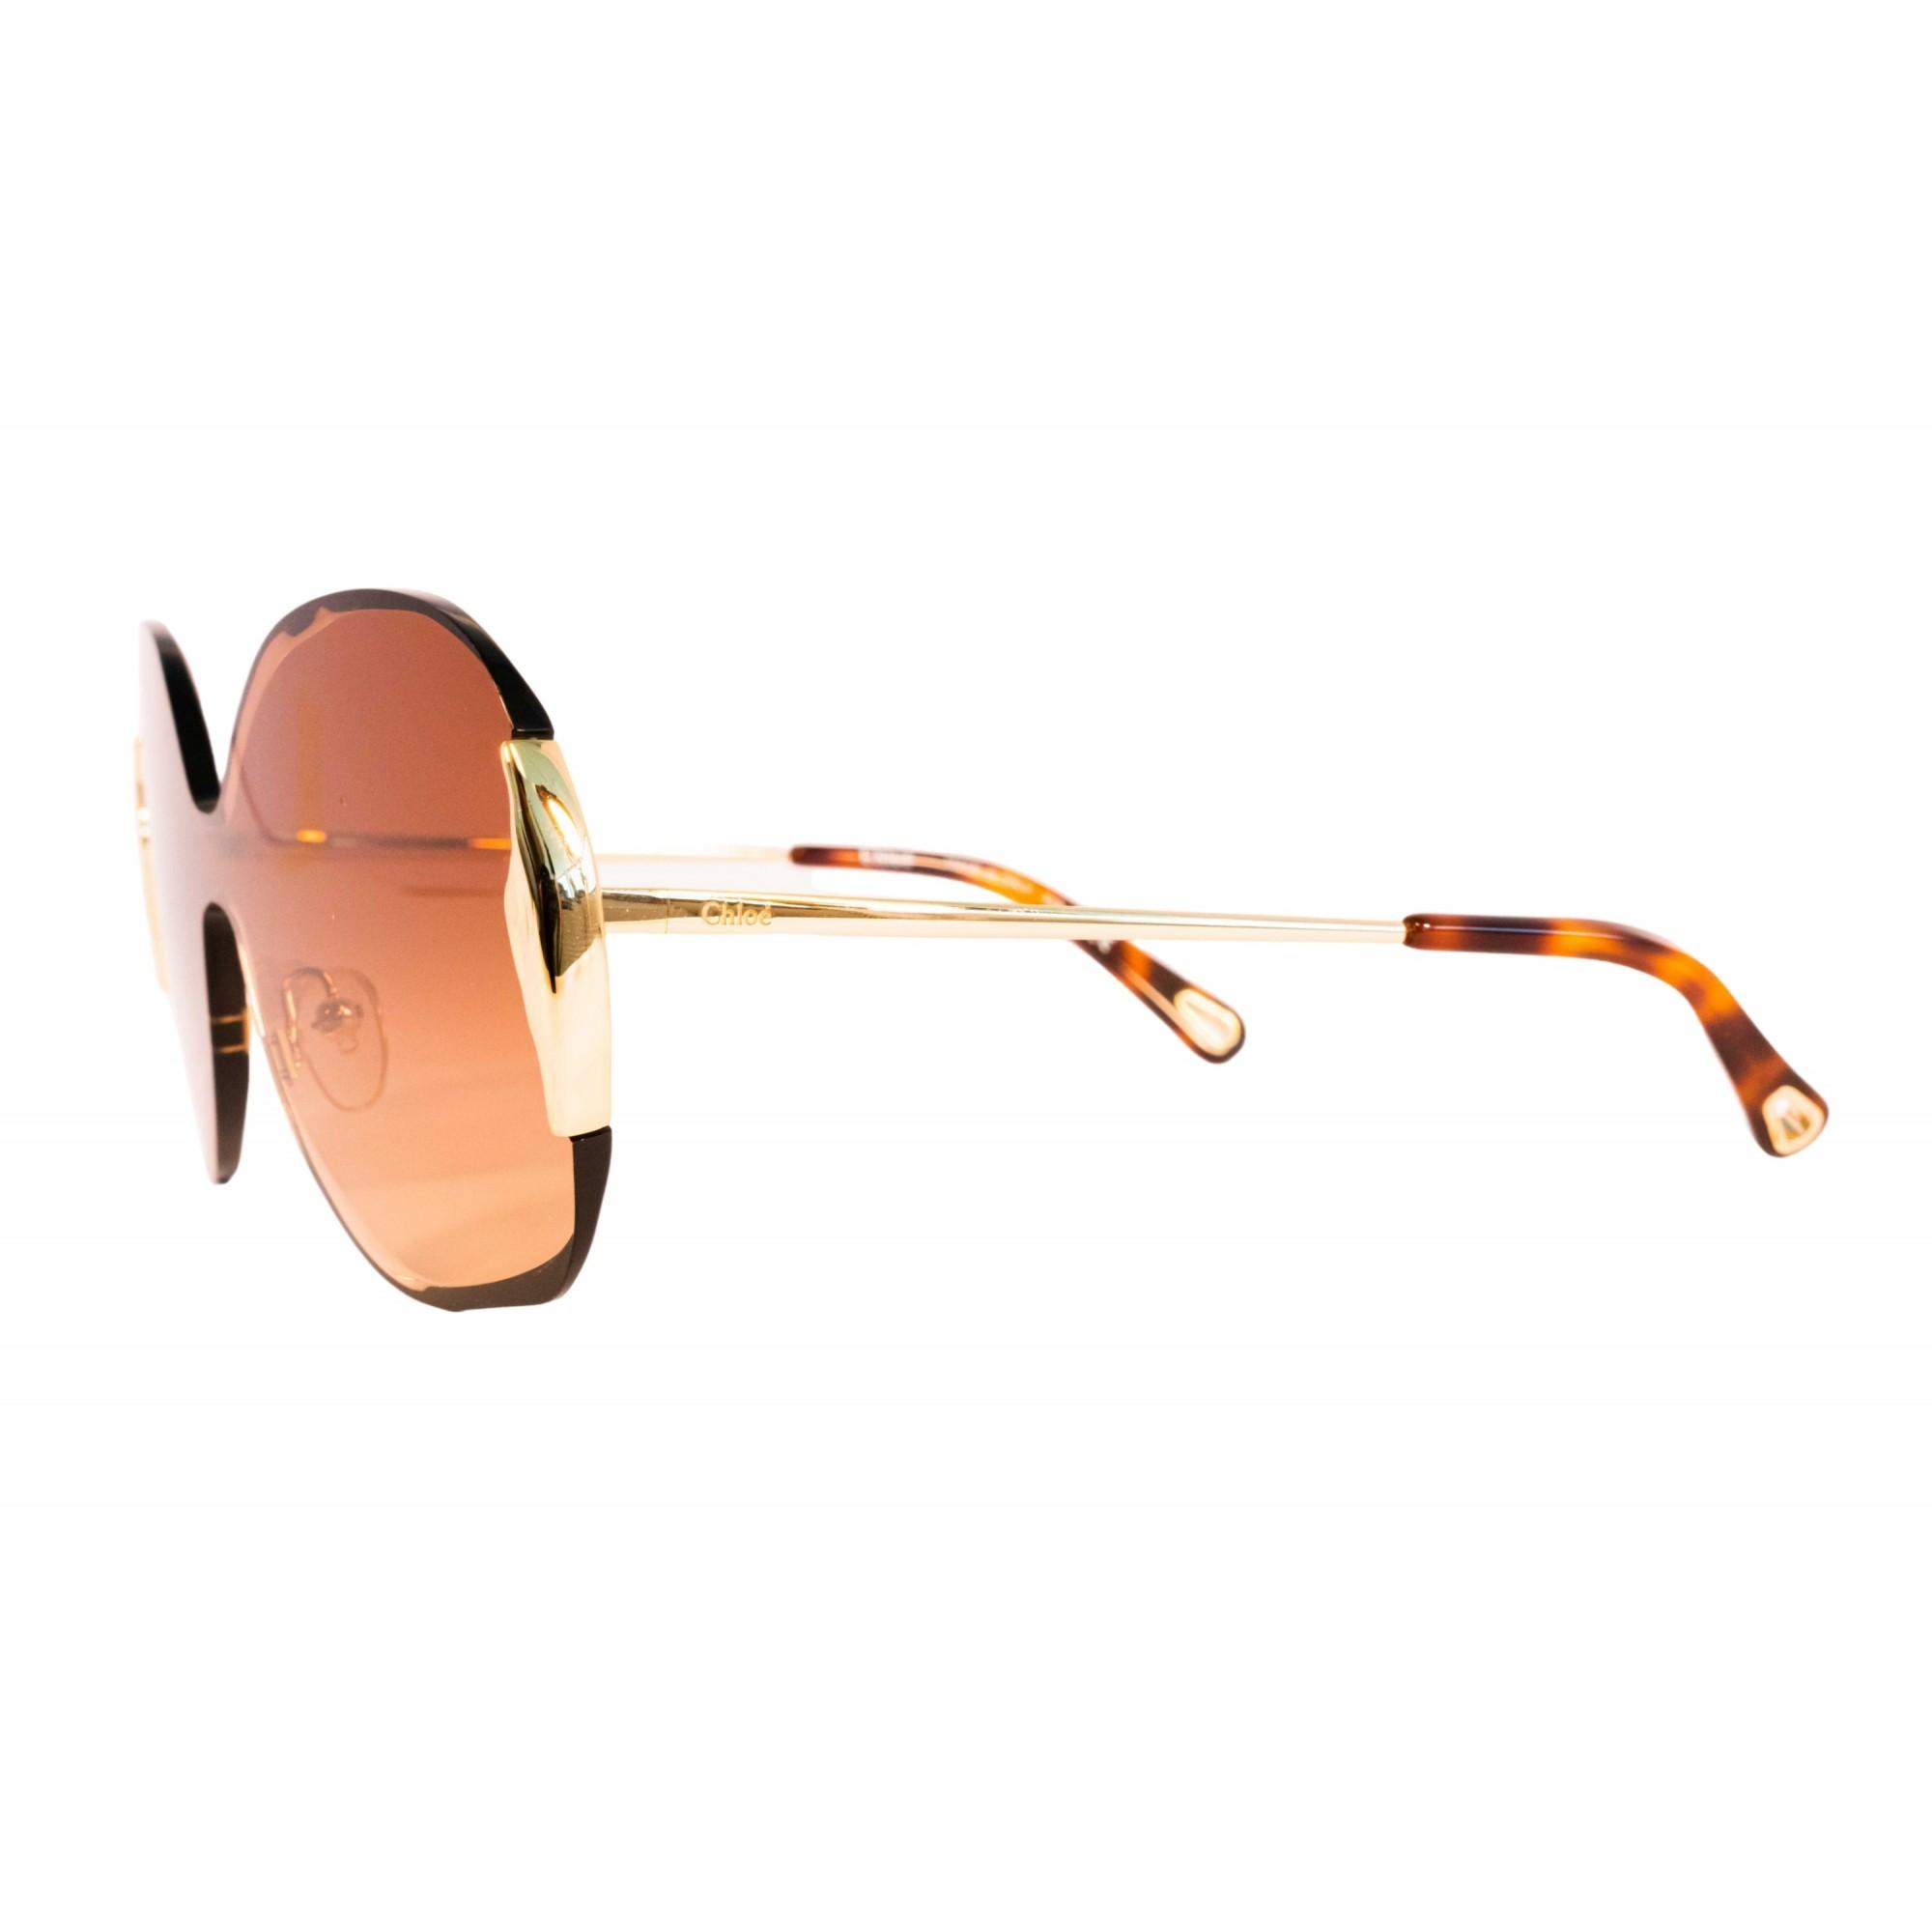 Óculos Chloe Máscara ce162s 742 59 Dourado